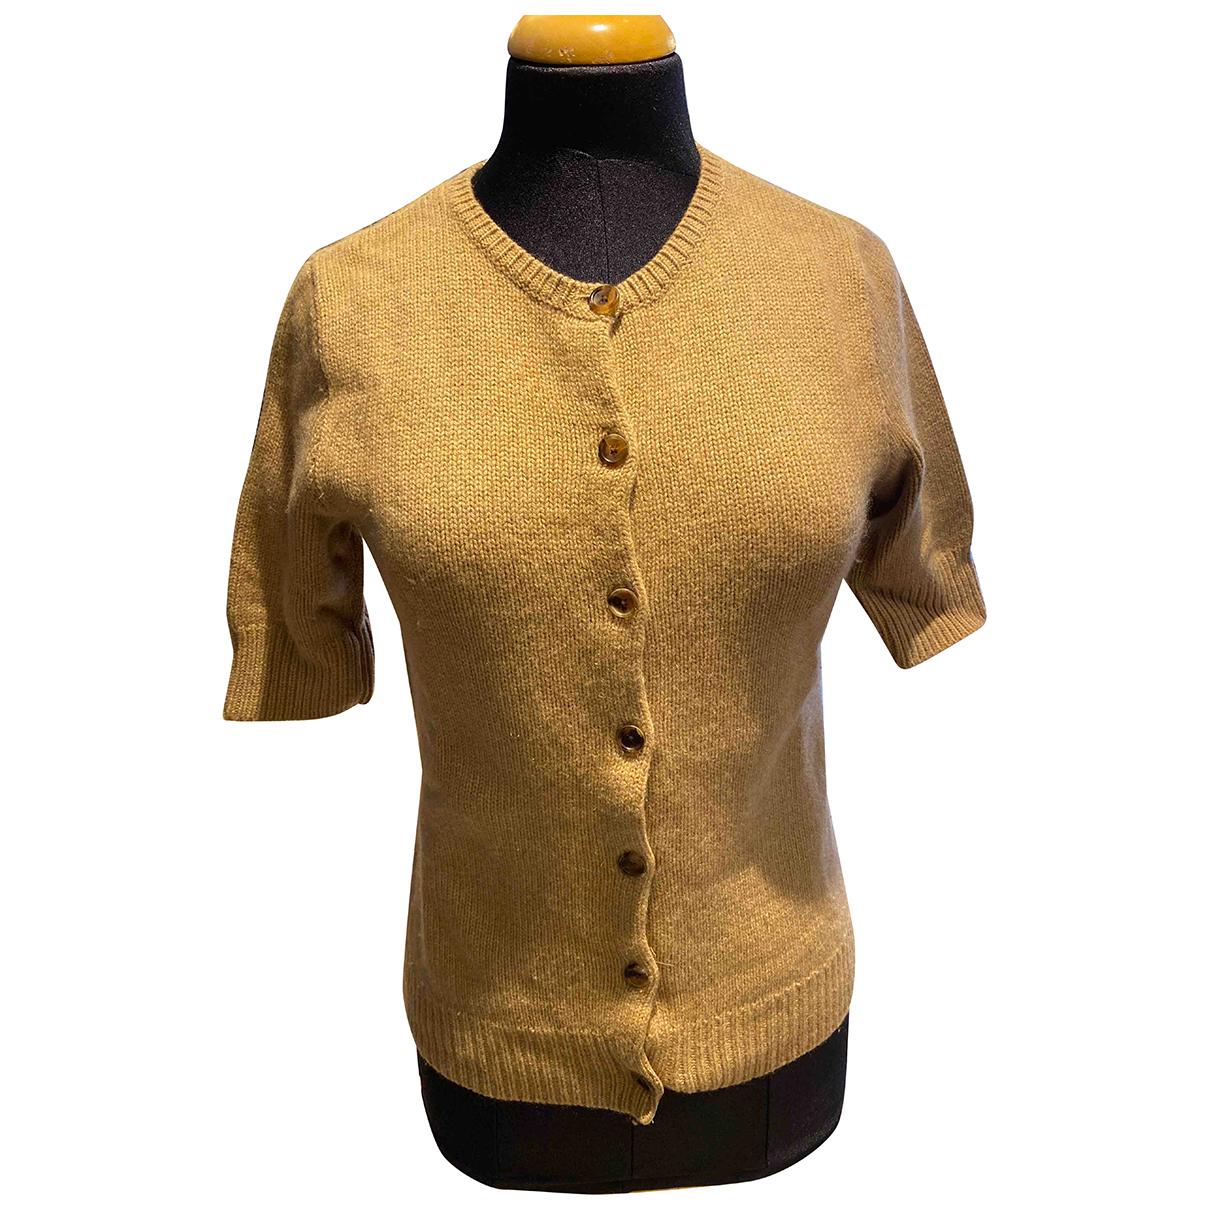 Ralph Lauren N Beige Cashmere Knitwear for Women L International